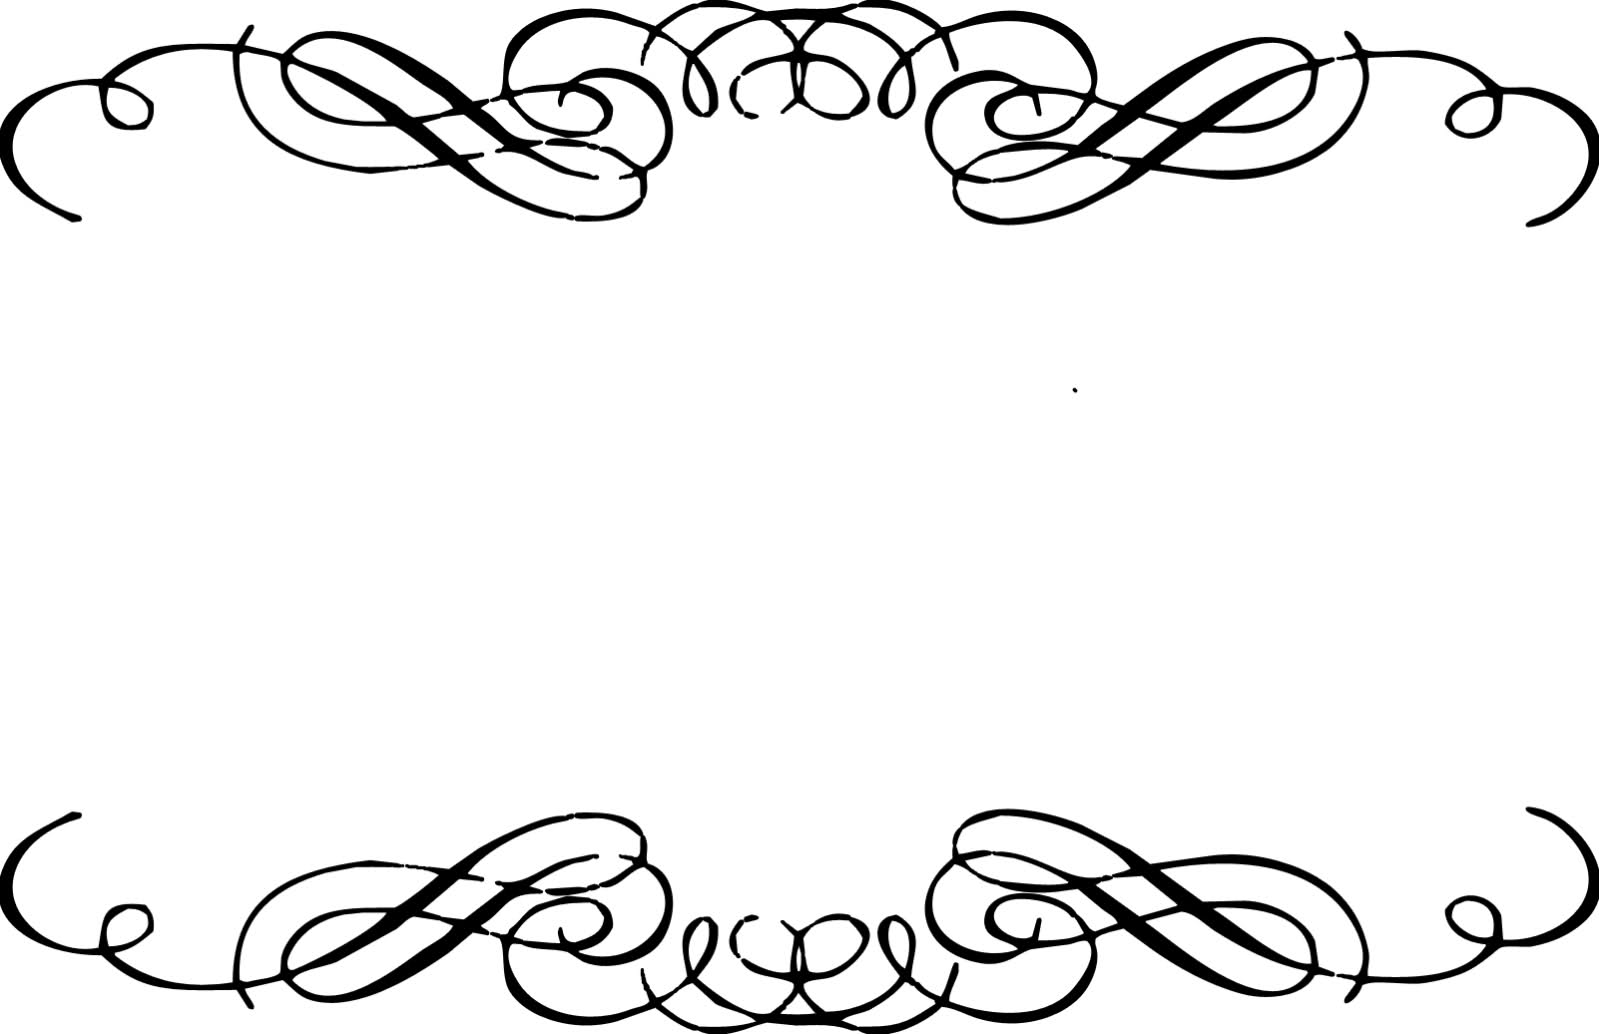 Free Decorative Designs Cliparts, Download Free Clip Art.